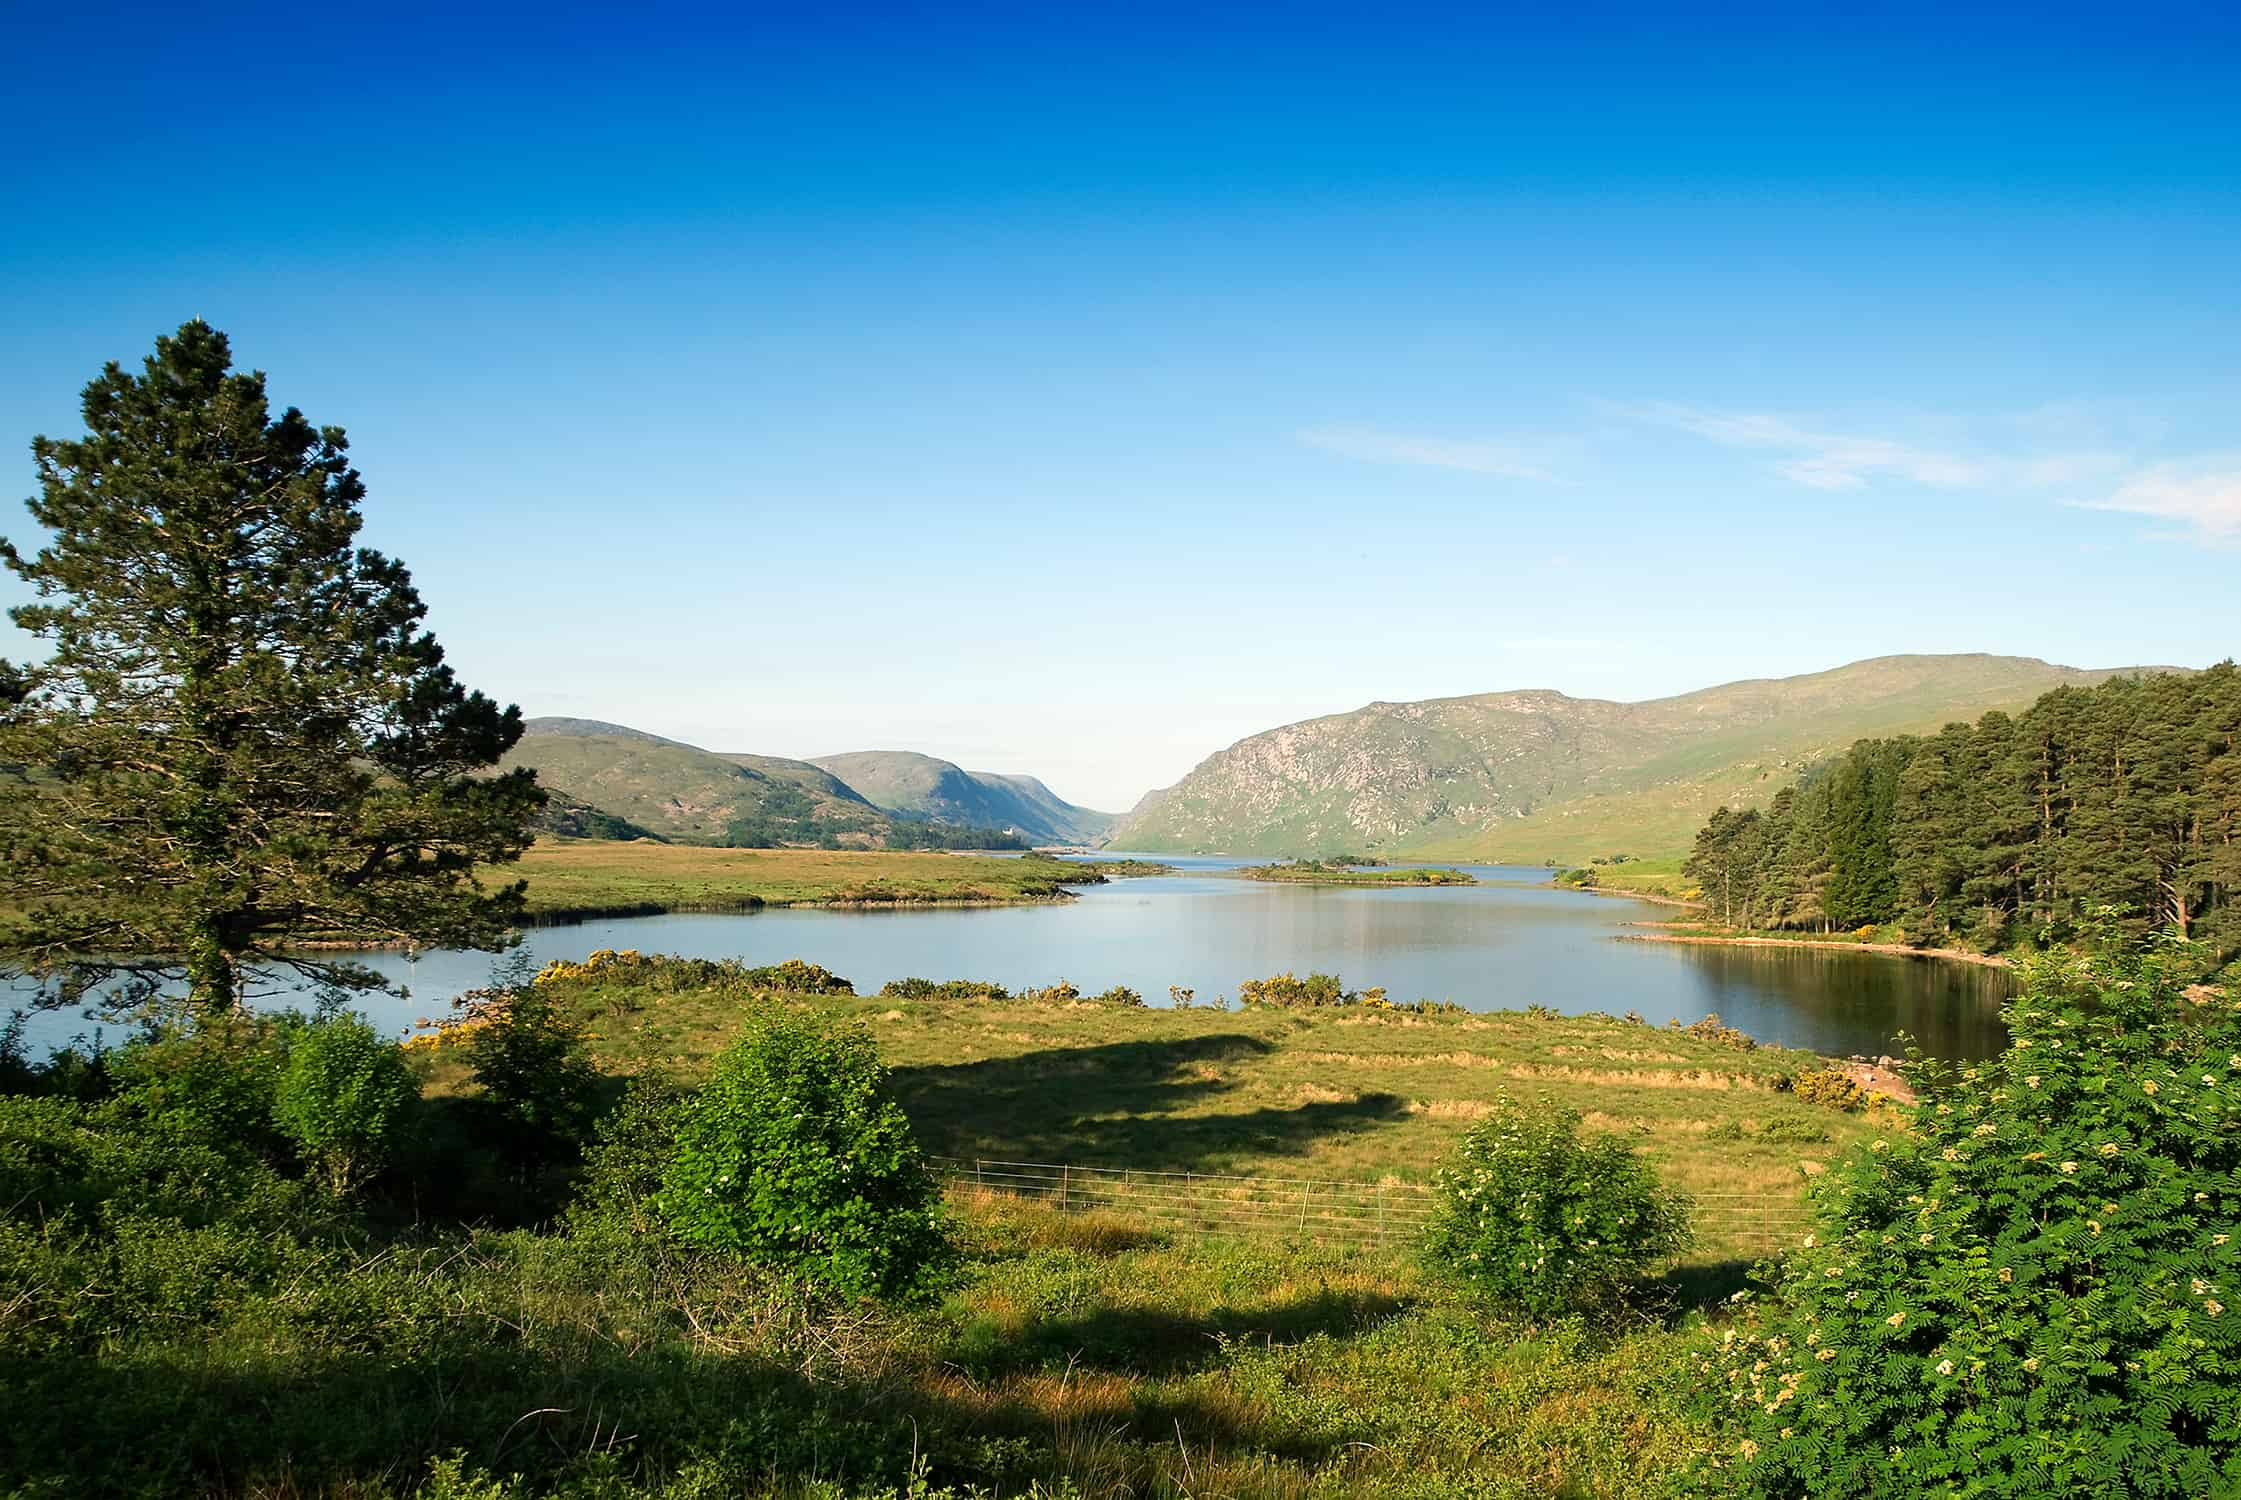 Glenveagh_National_Park_(2579034038)